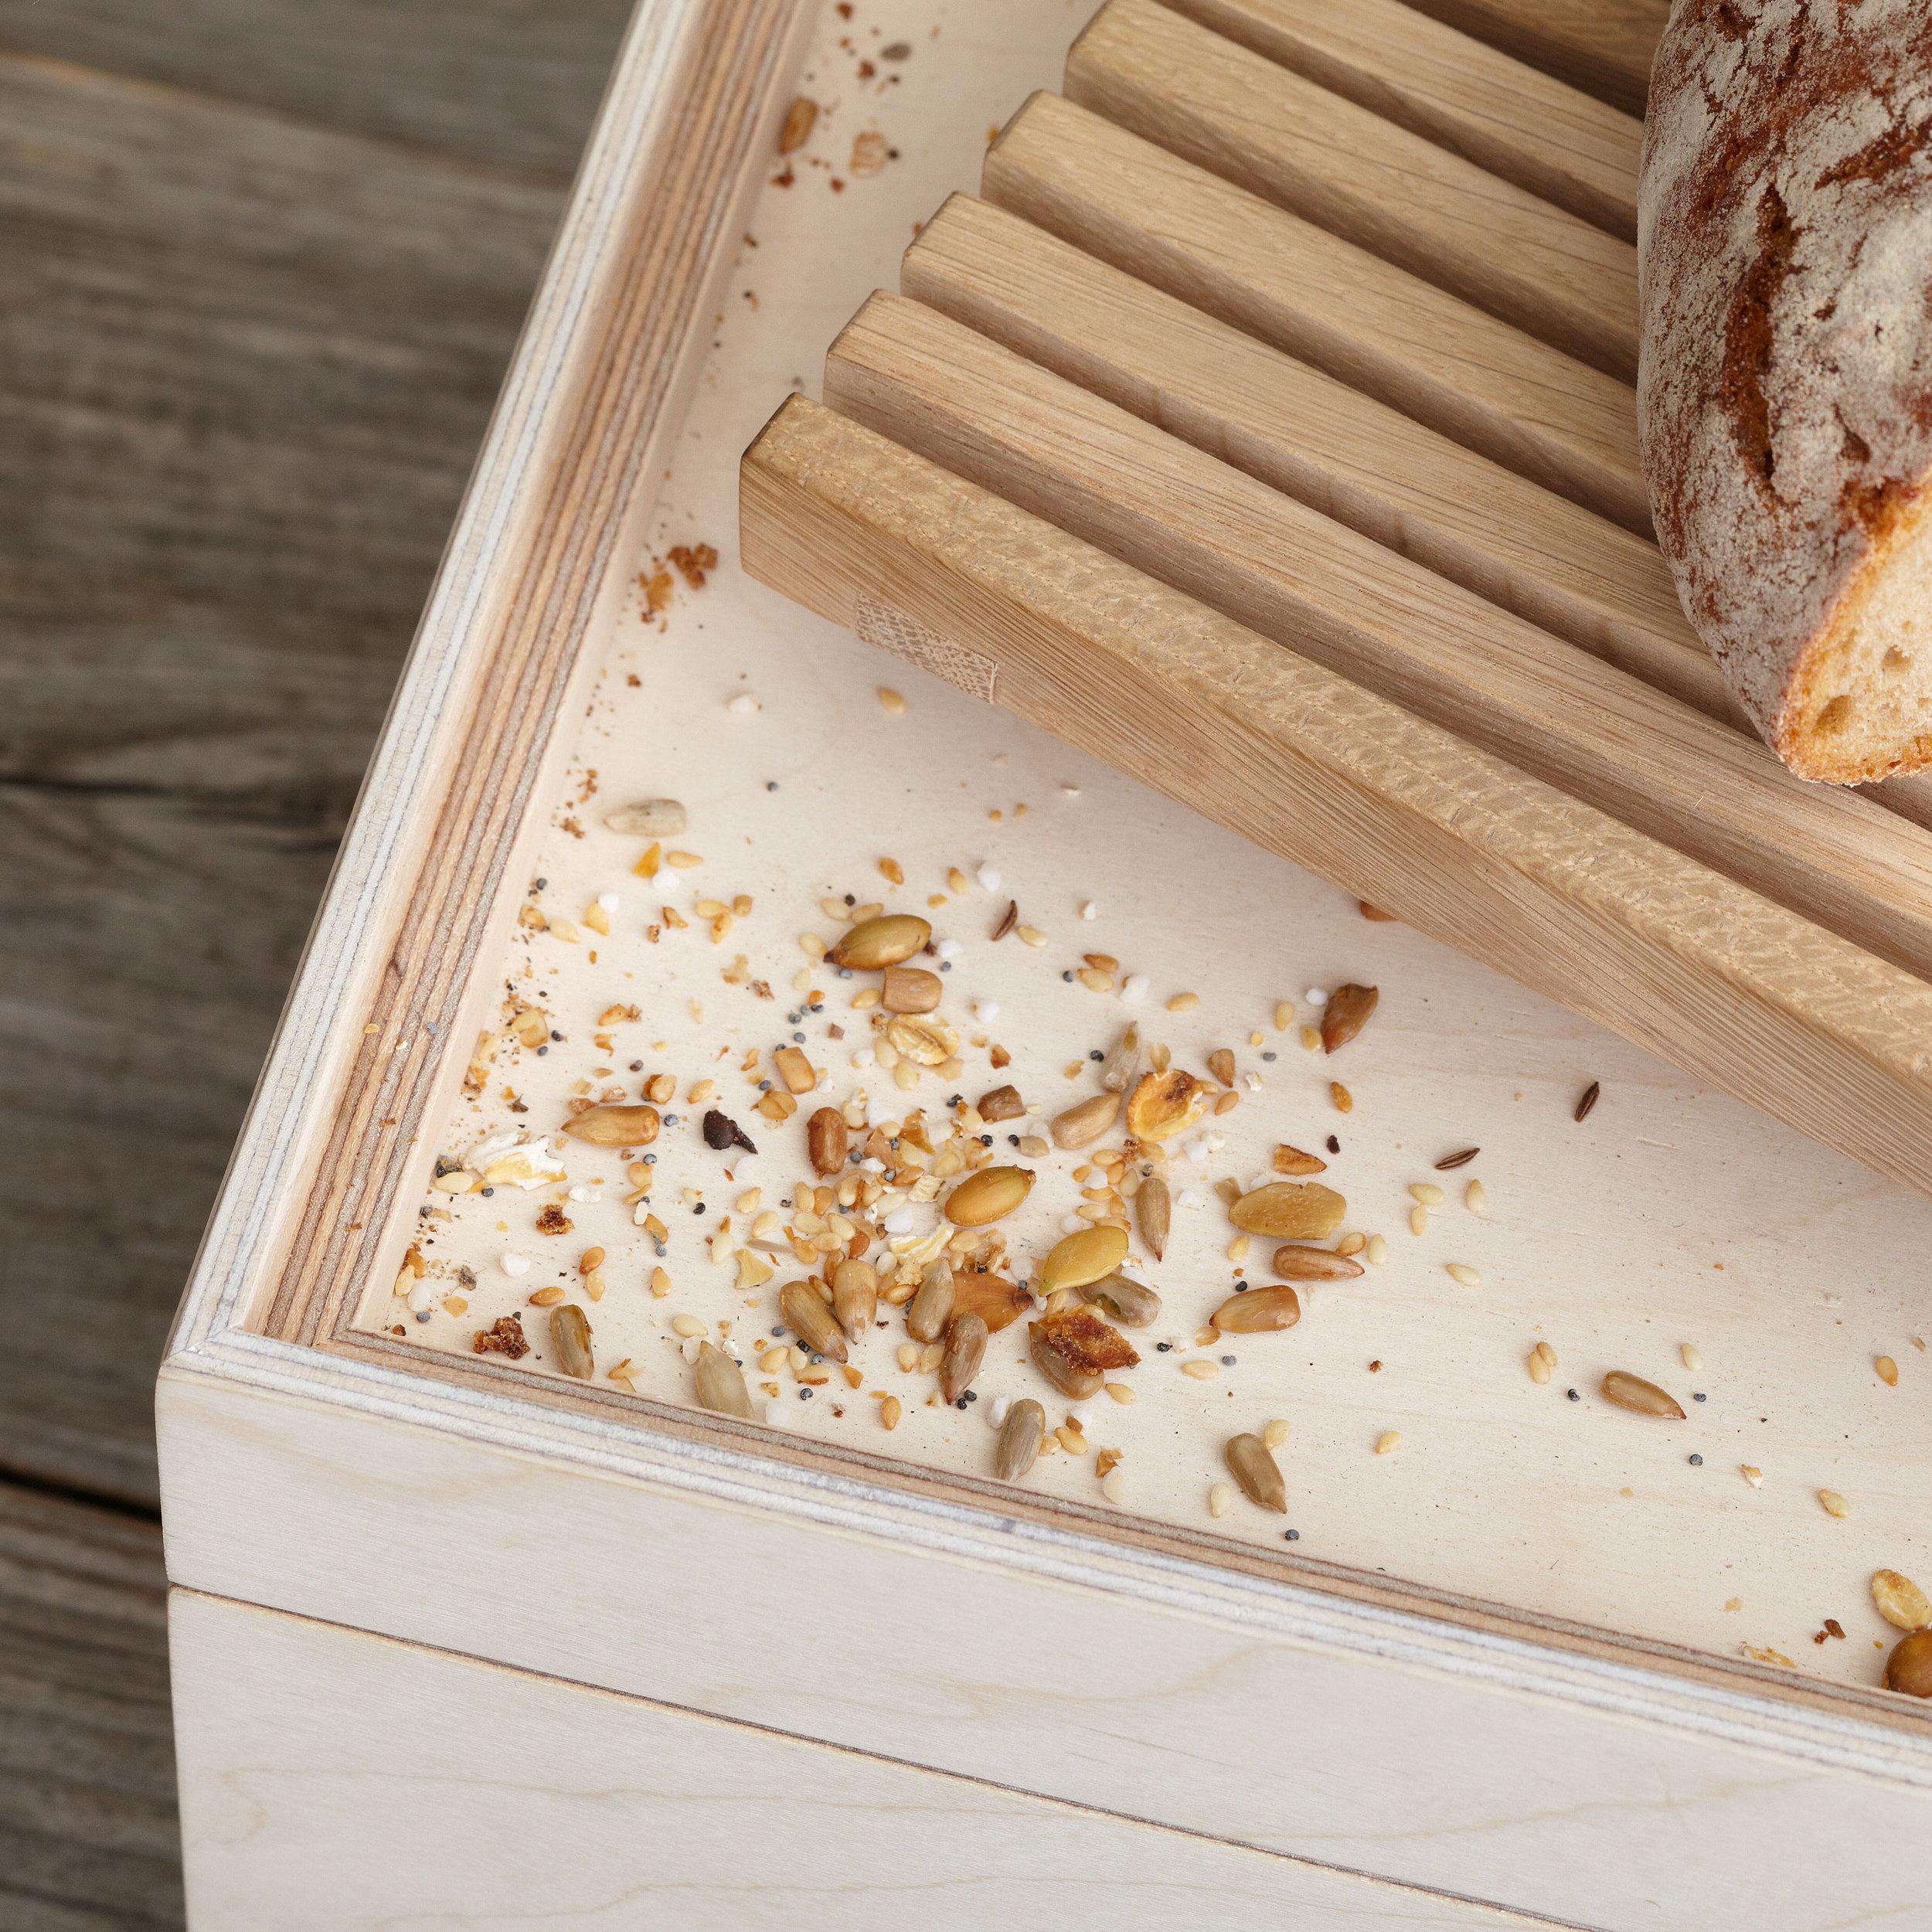 Sonntagsstaat-BreadBin-Detail01.jpg